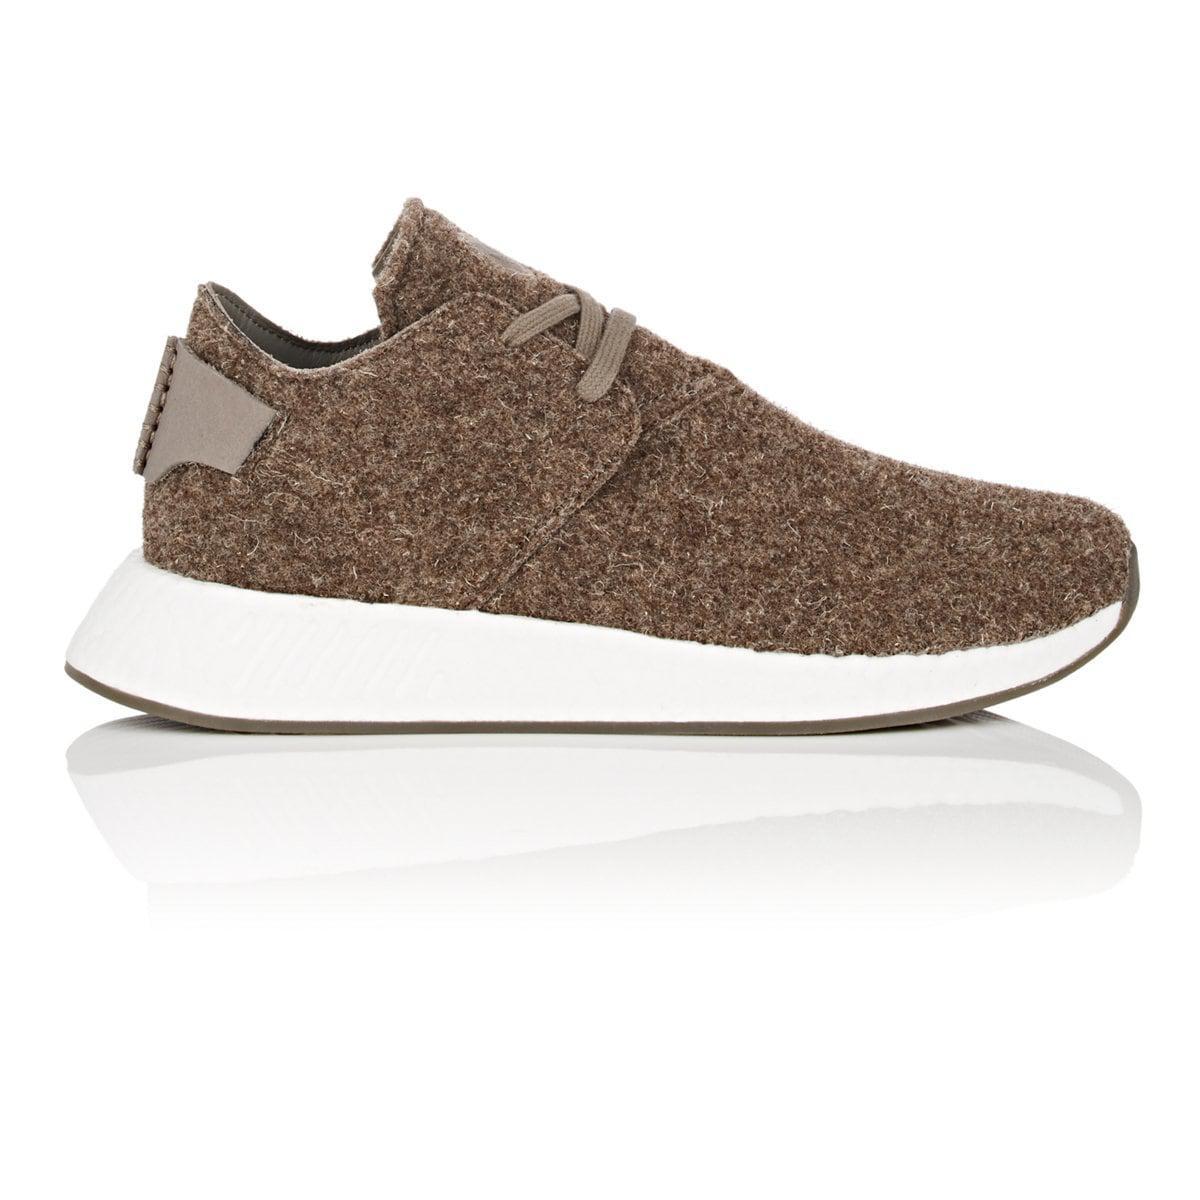 def692c01 Lyst - adidas Nmd C2 Felt Chukka Sneakers in Brown for Men